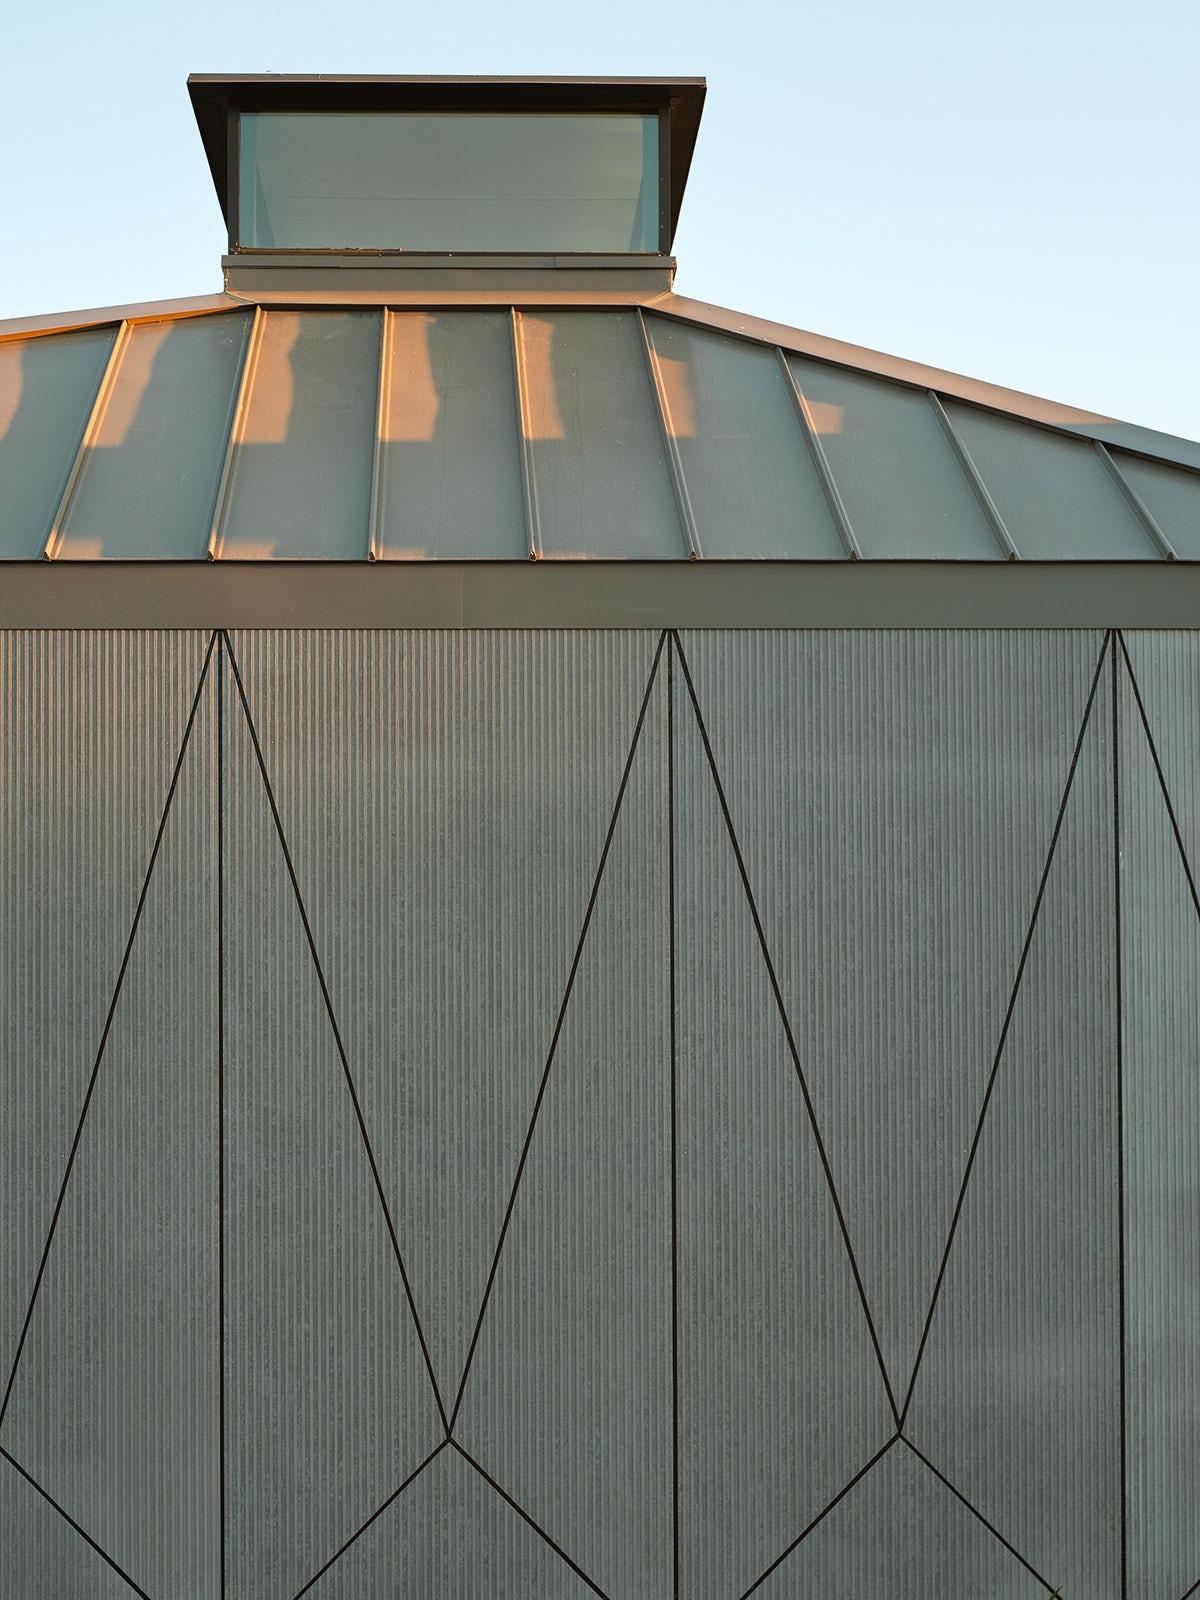 © Michael Hsu Office of Architecture